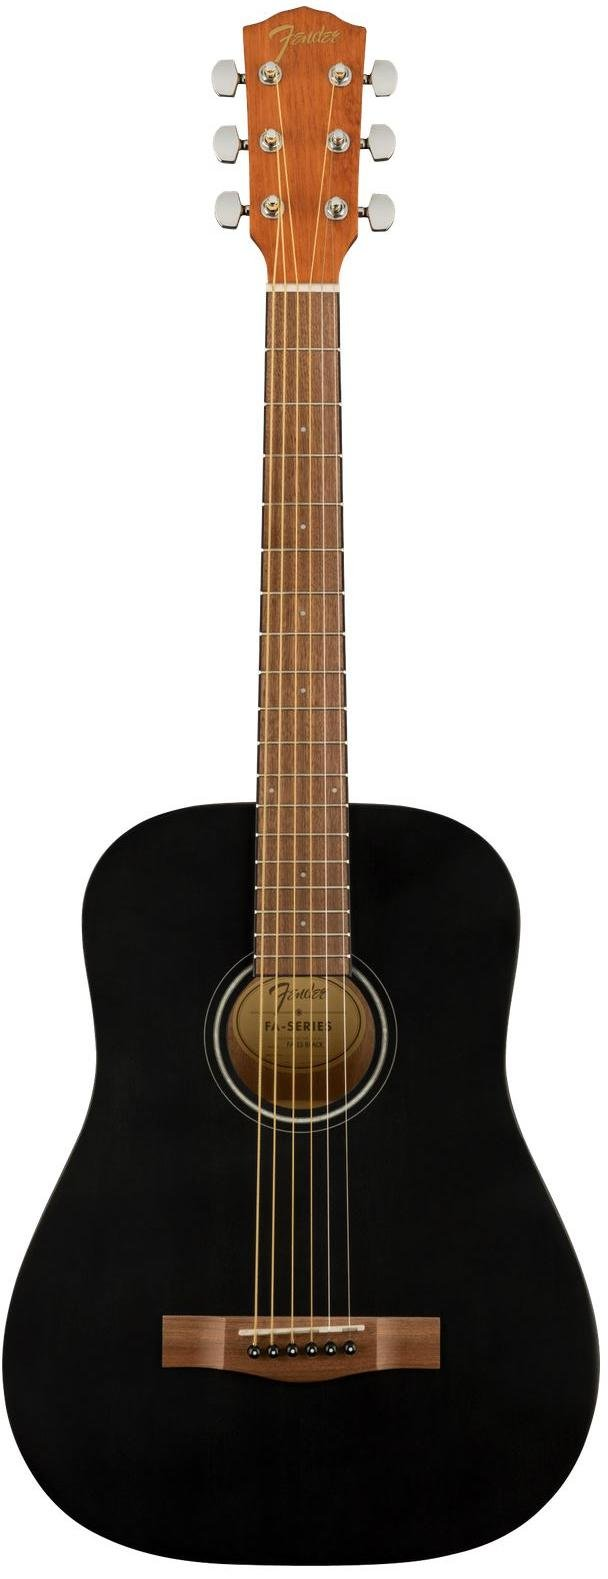 Fender FA-15 3/4 Scale Steel with Gig Bag, Walnut Fingerboard - Black